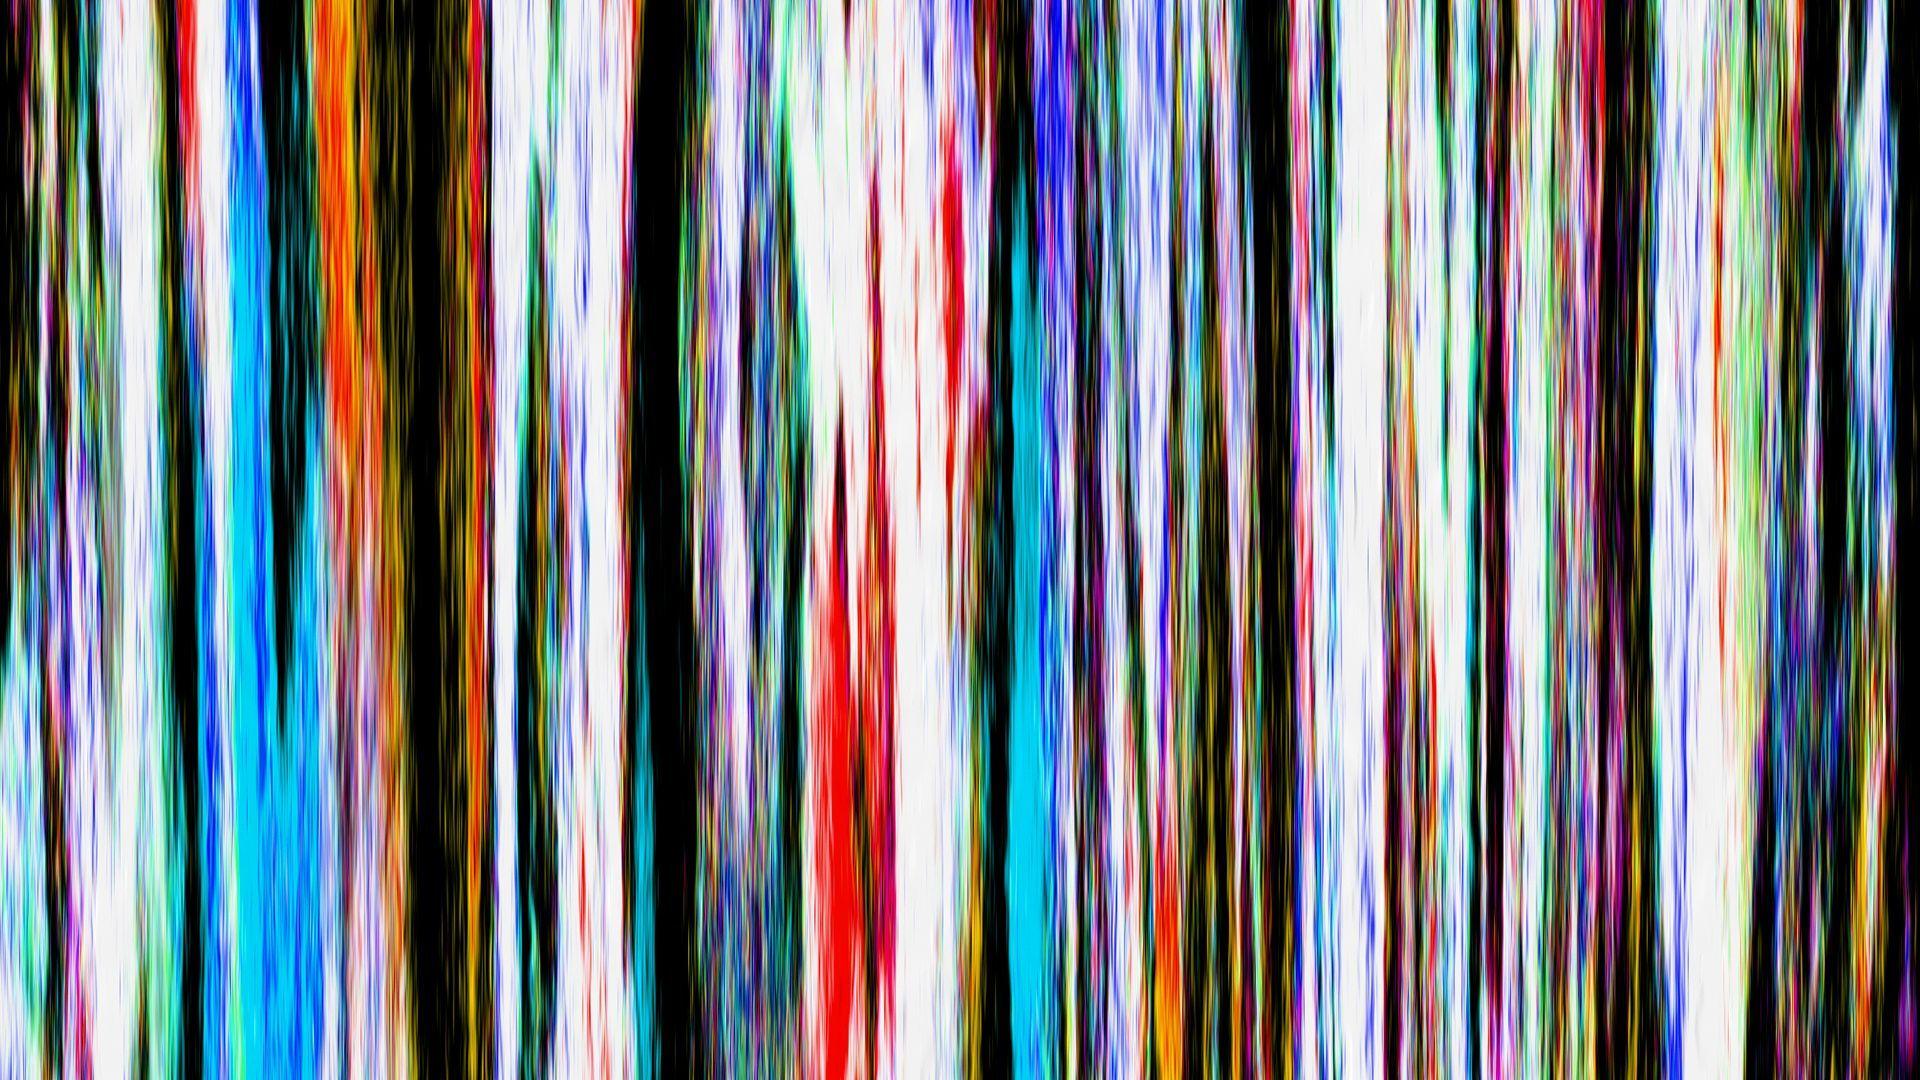 peter saville art - Google Search